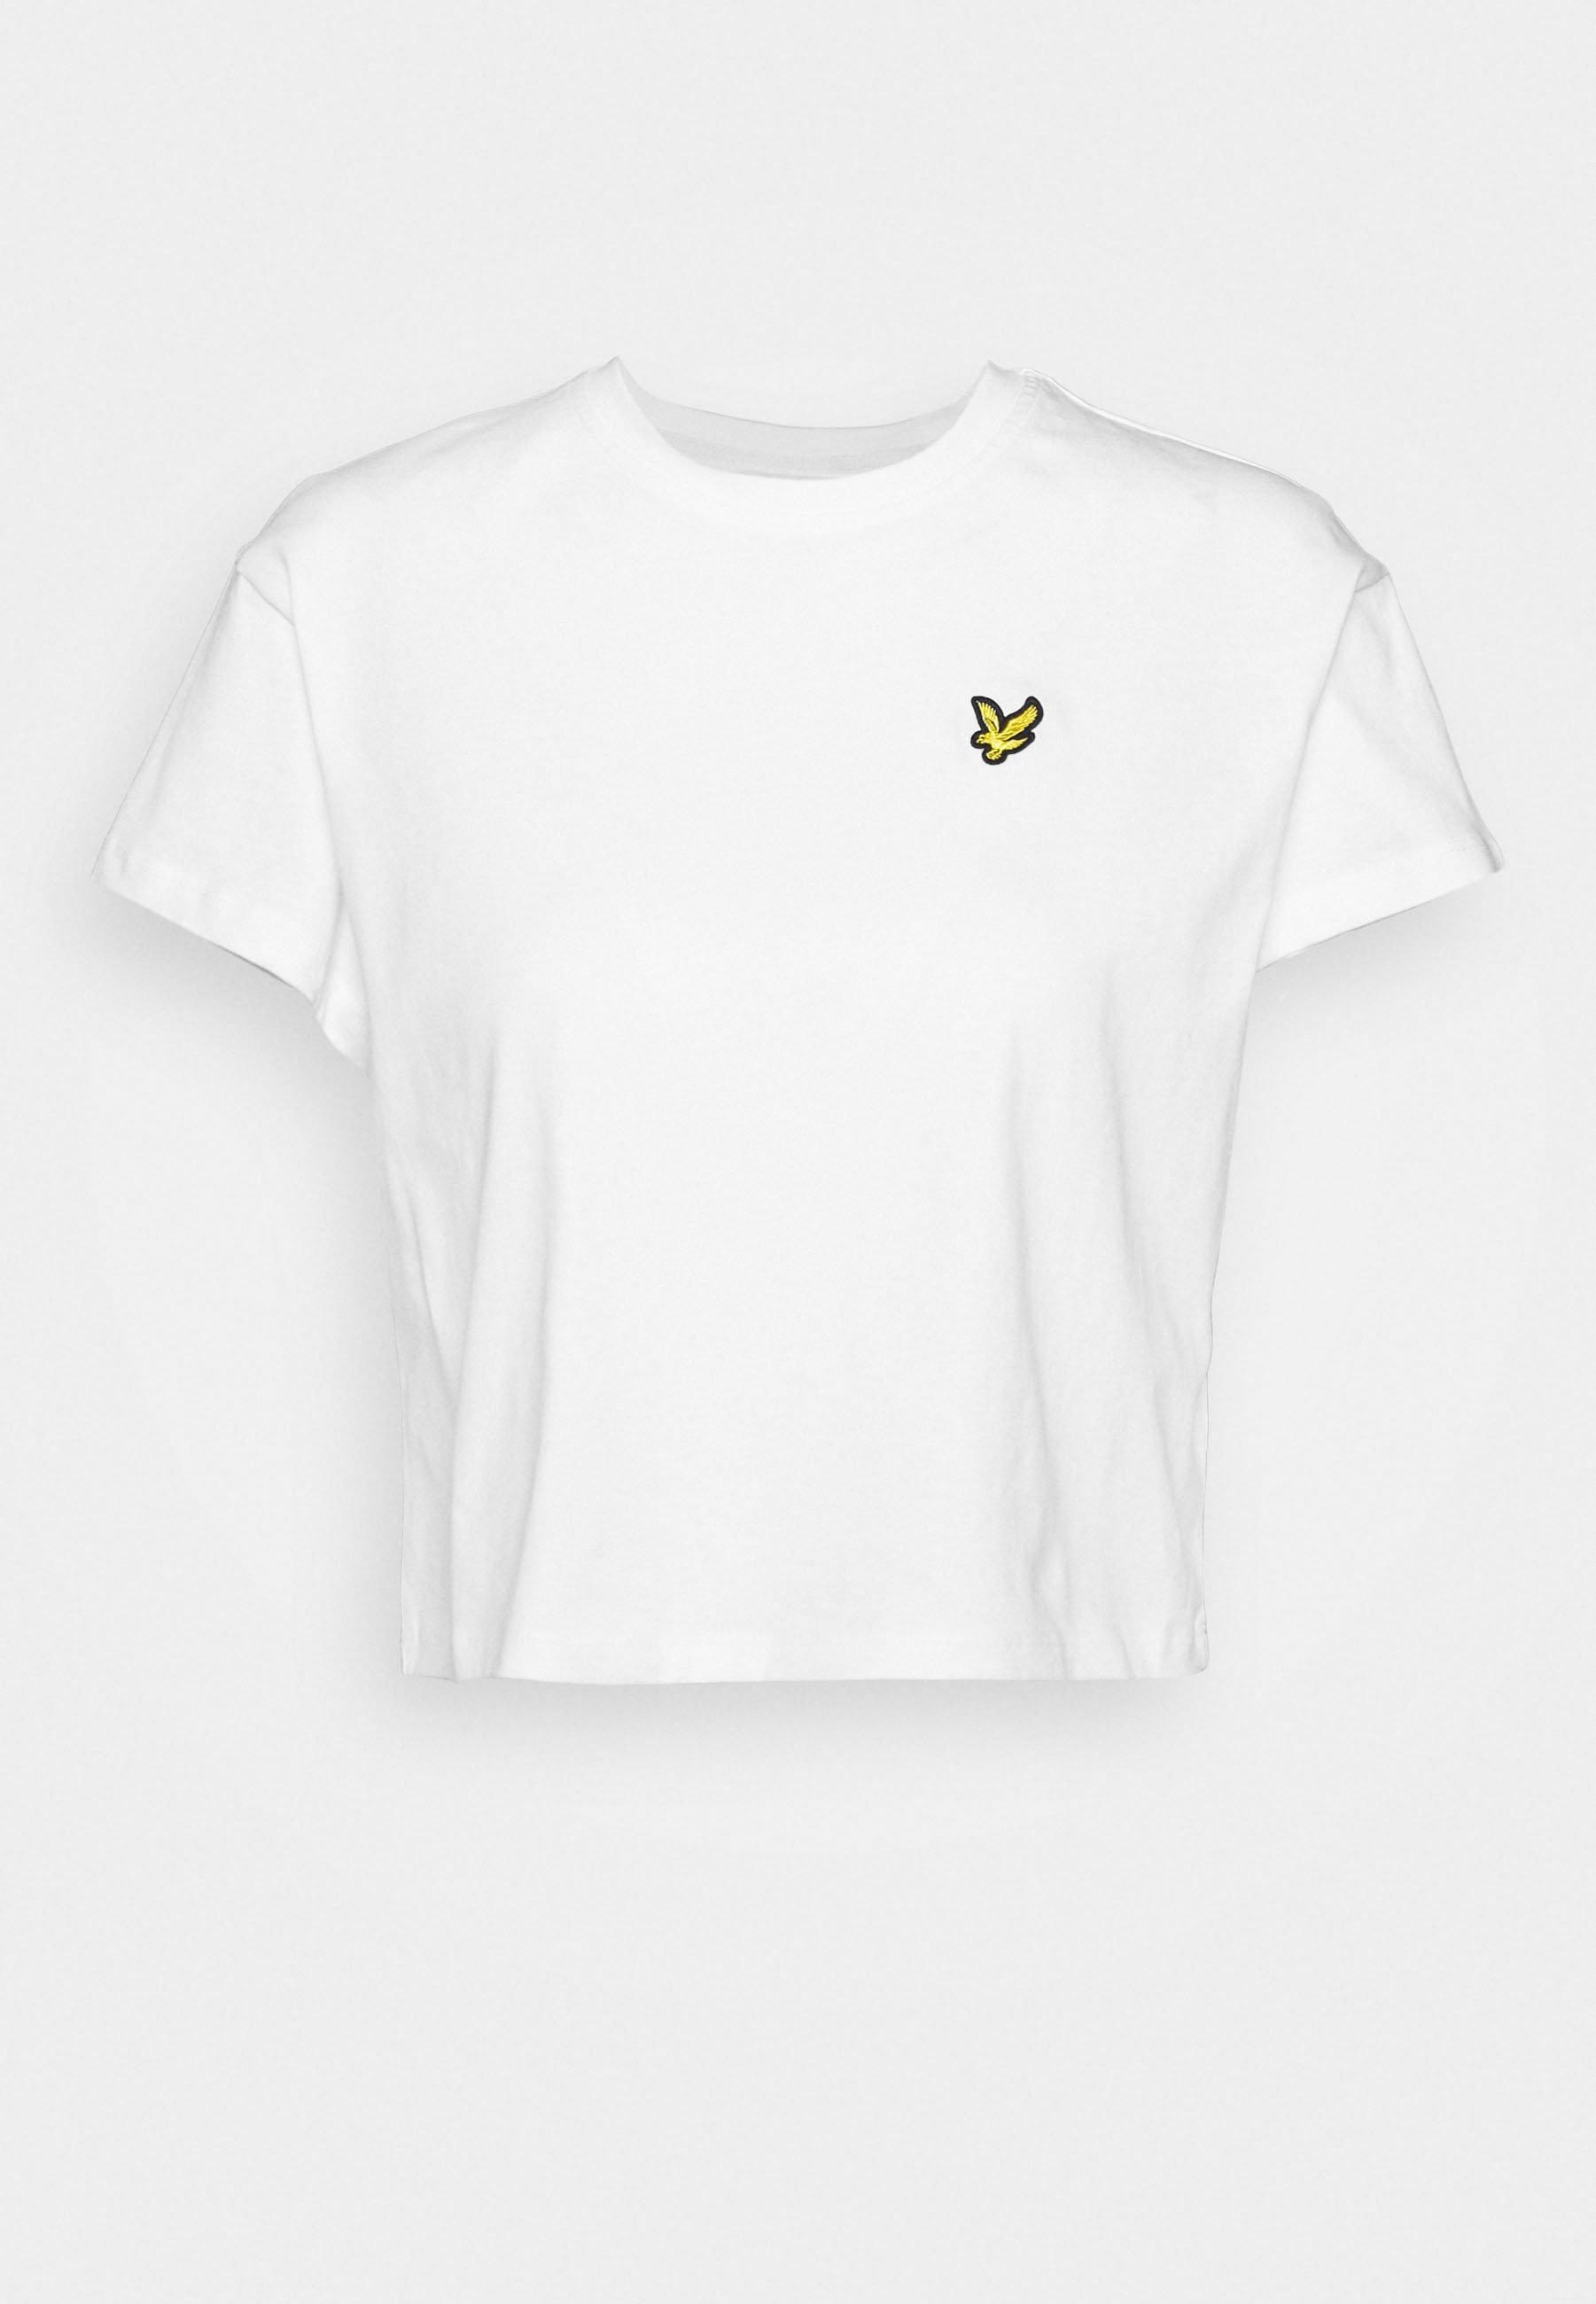 Lyle & Scott Cropped - T-shirts White/hvit